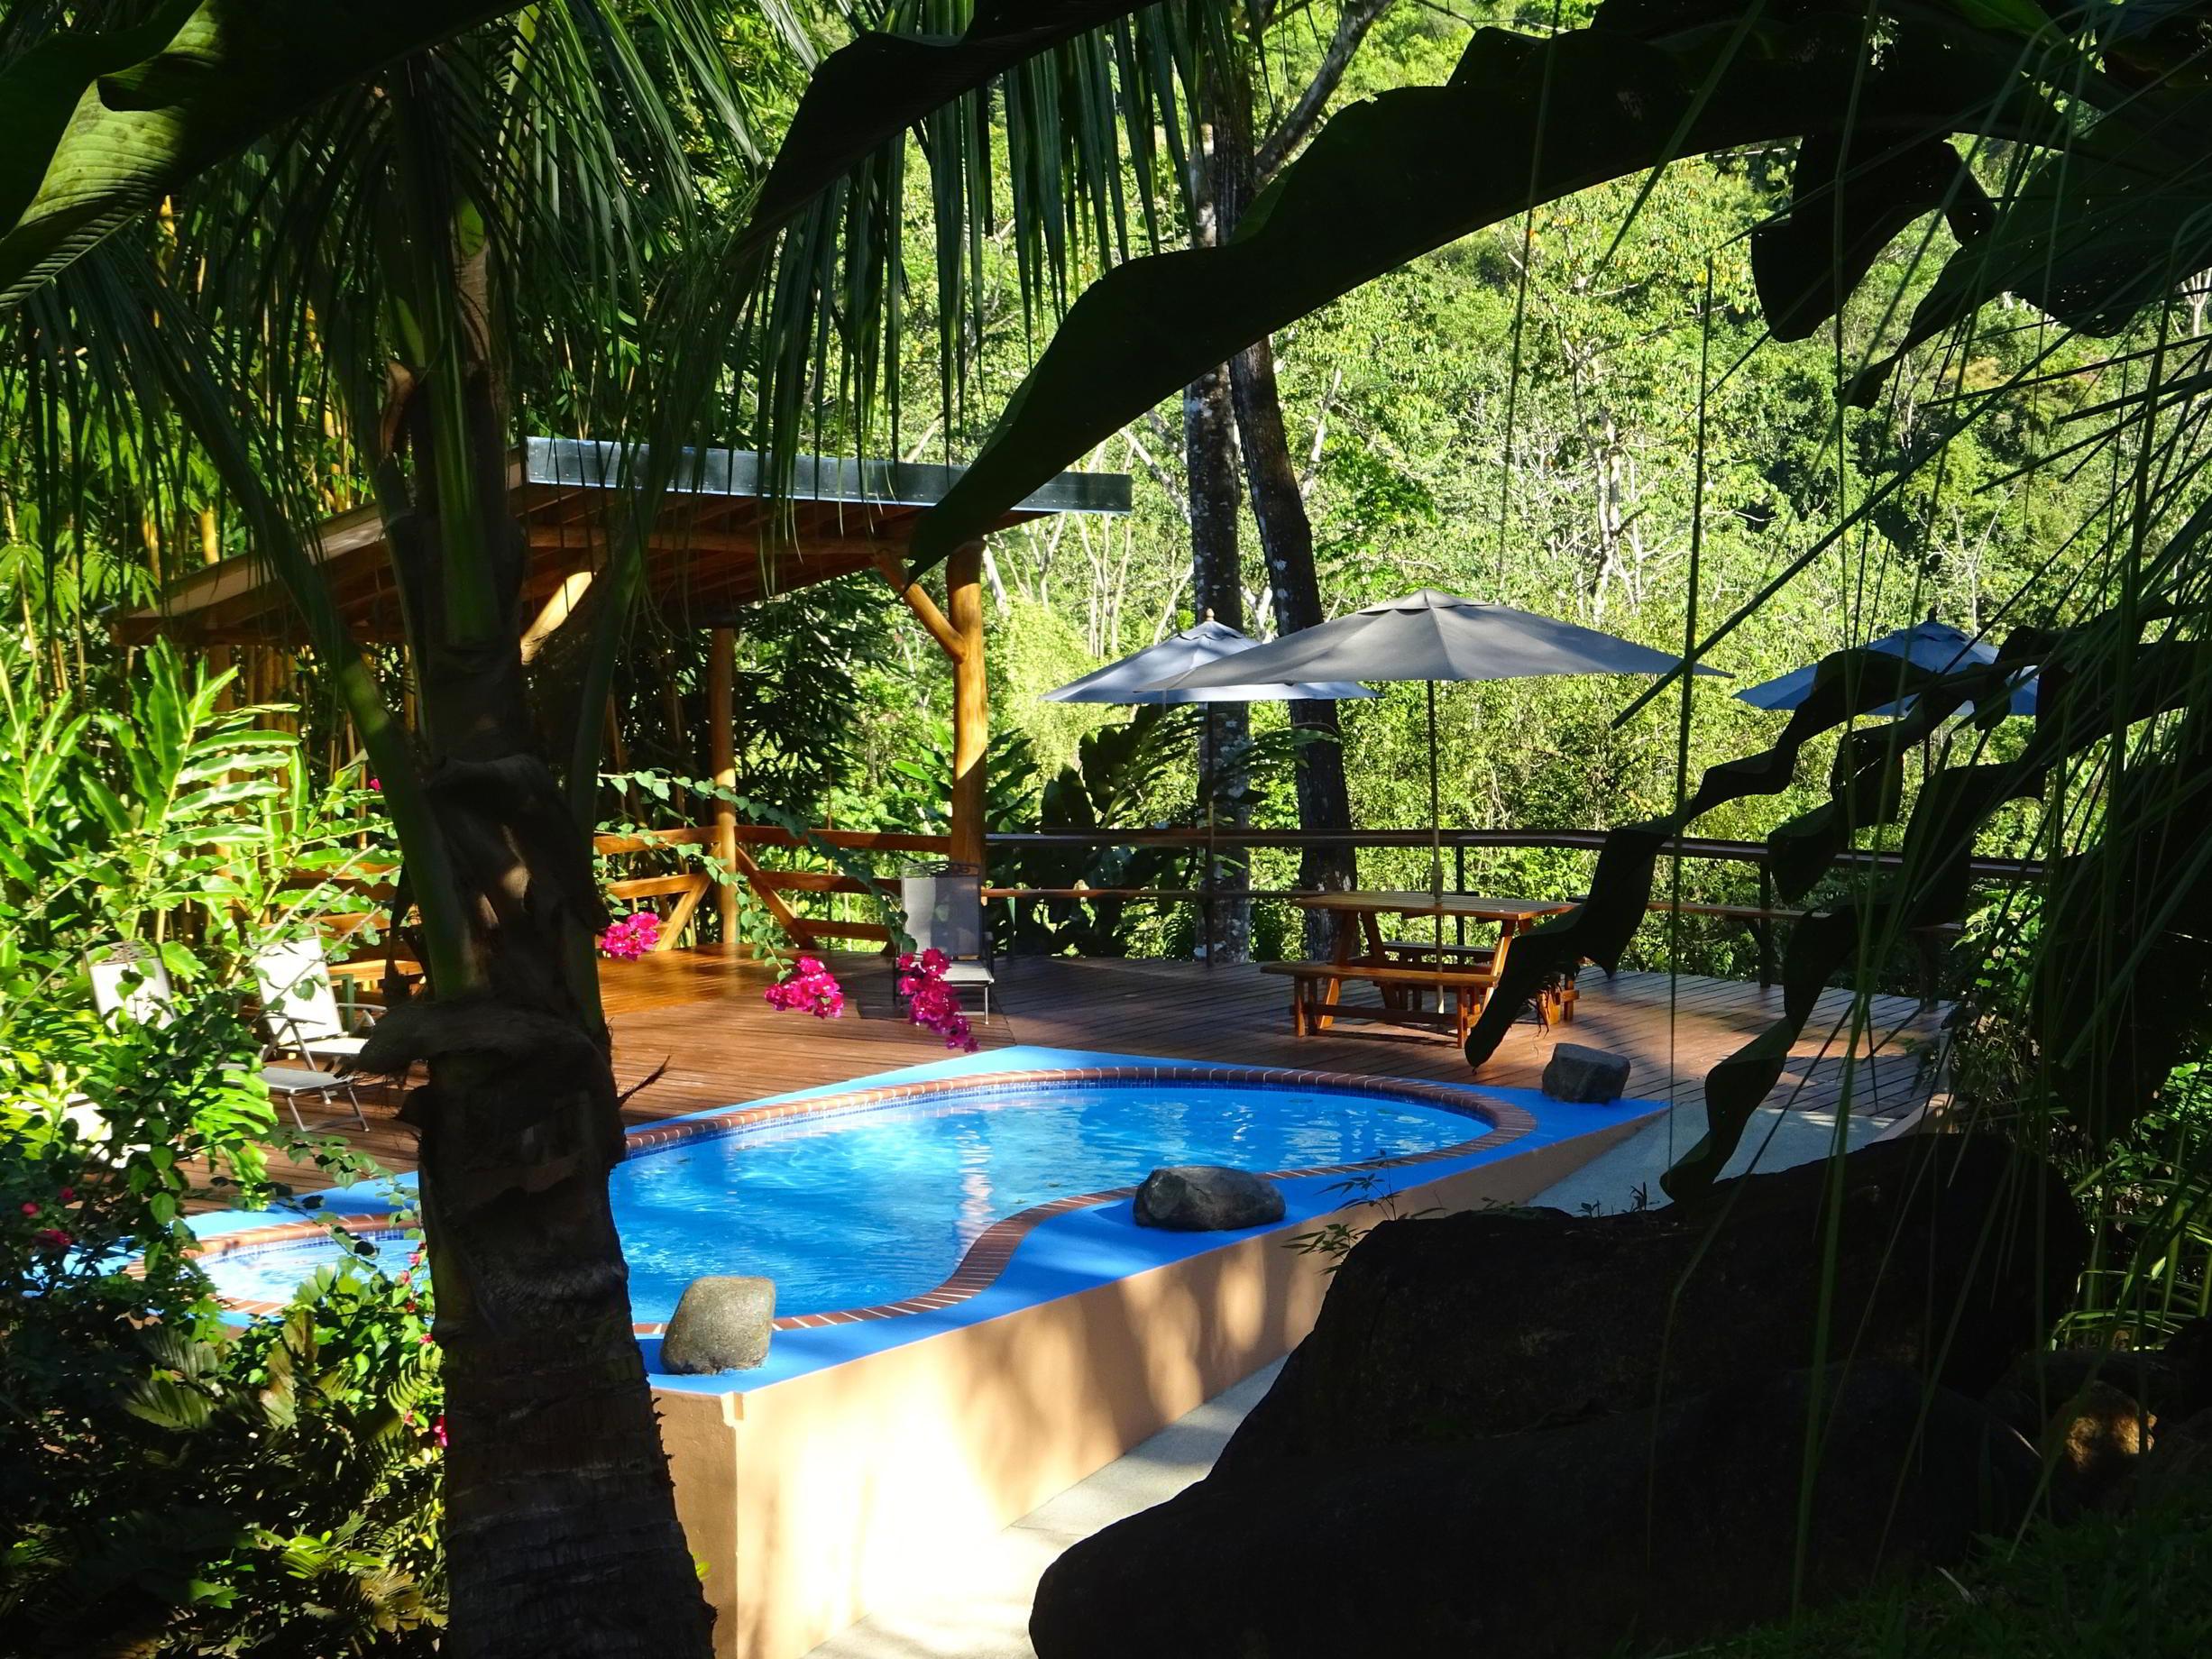 manoas, uvita hotels, osa hotels, costa rica vacations, visit costa rica, costaballenalovers, puravida, (5)